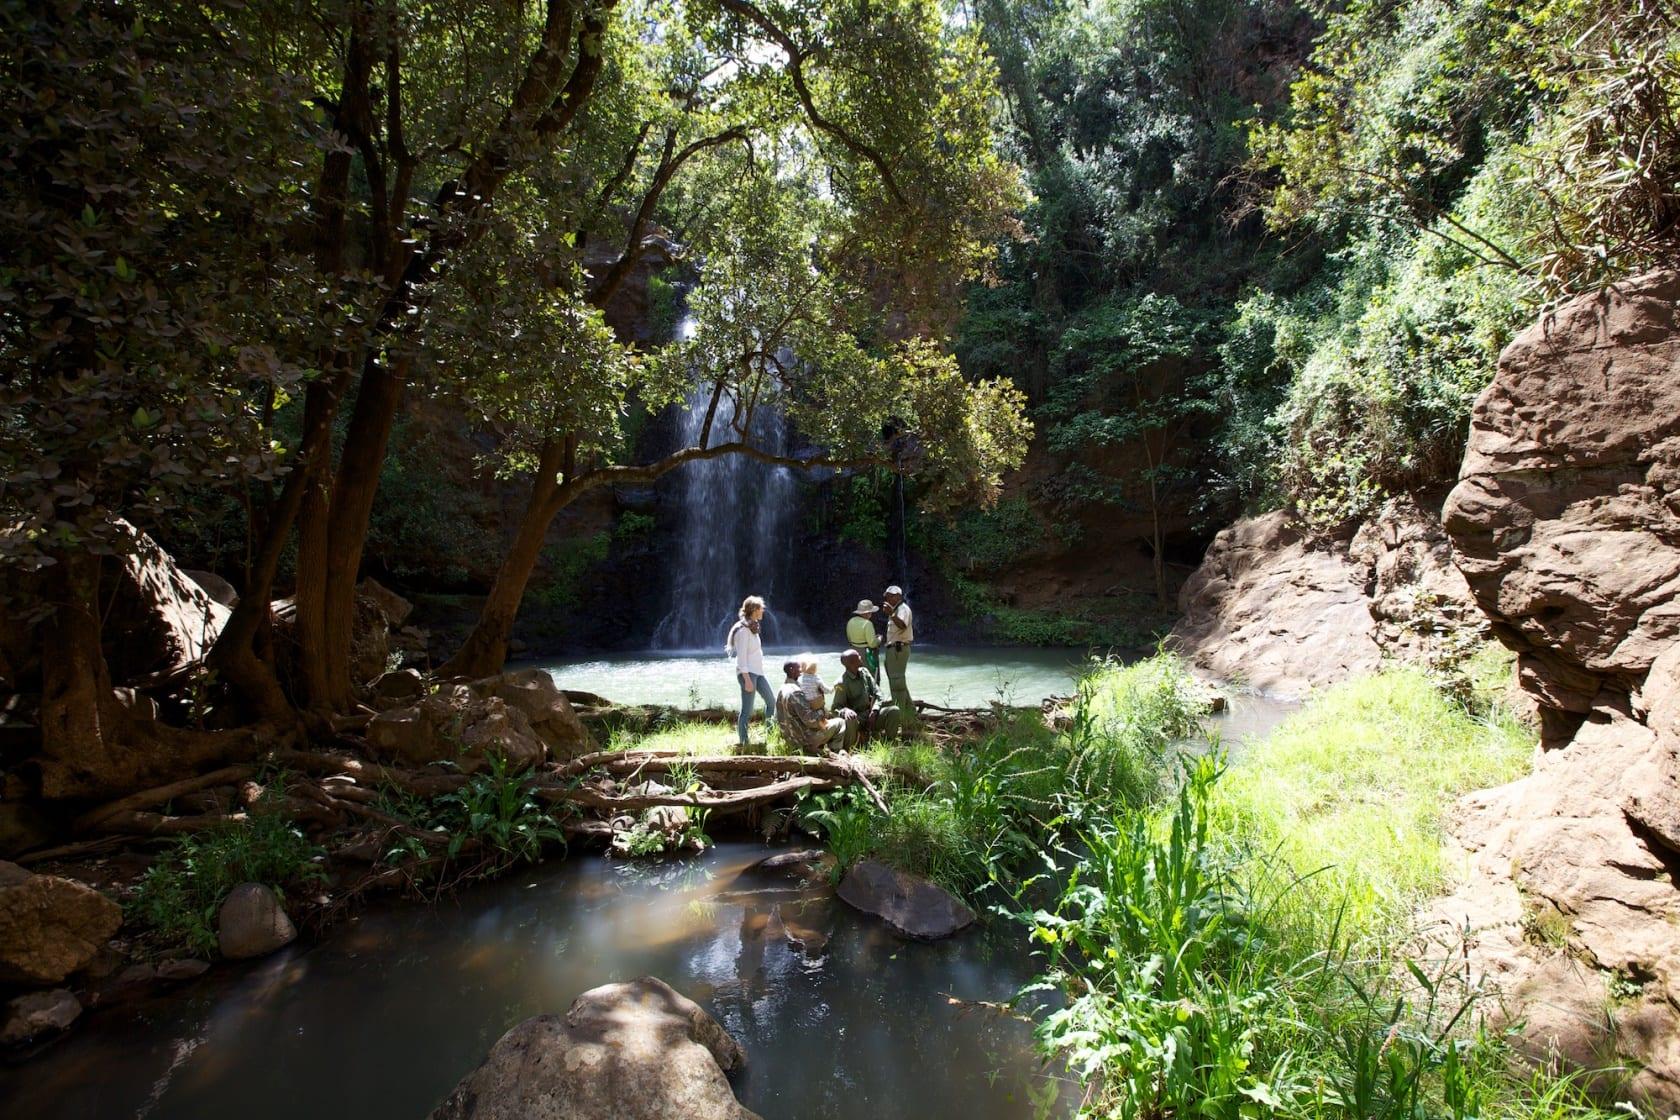 Ngare Ndare Forest Walk at Lewa Safari Camp